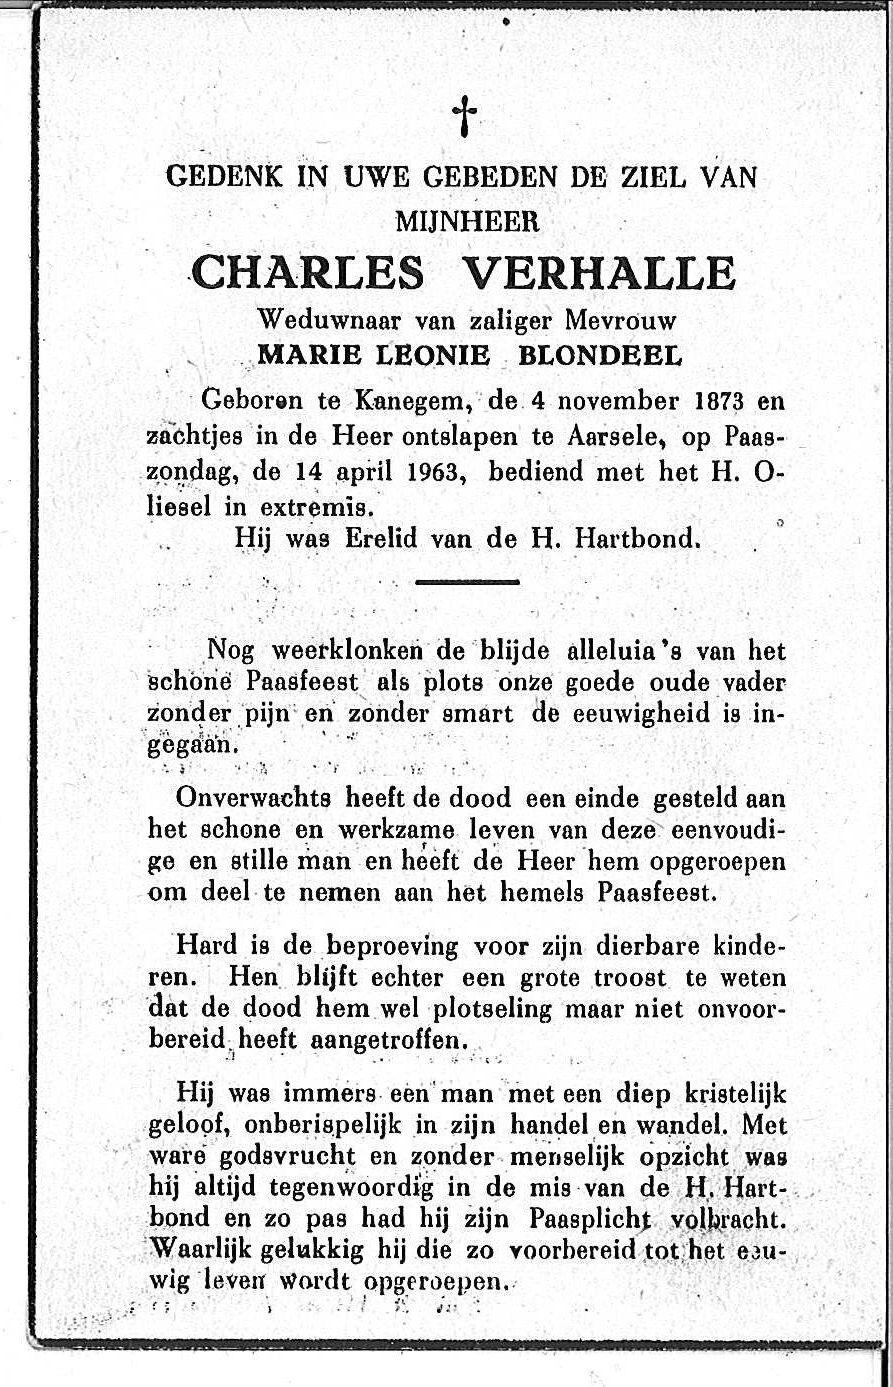 Charles Verhalle